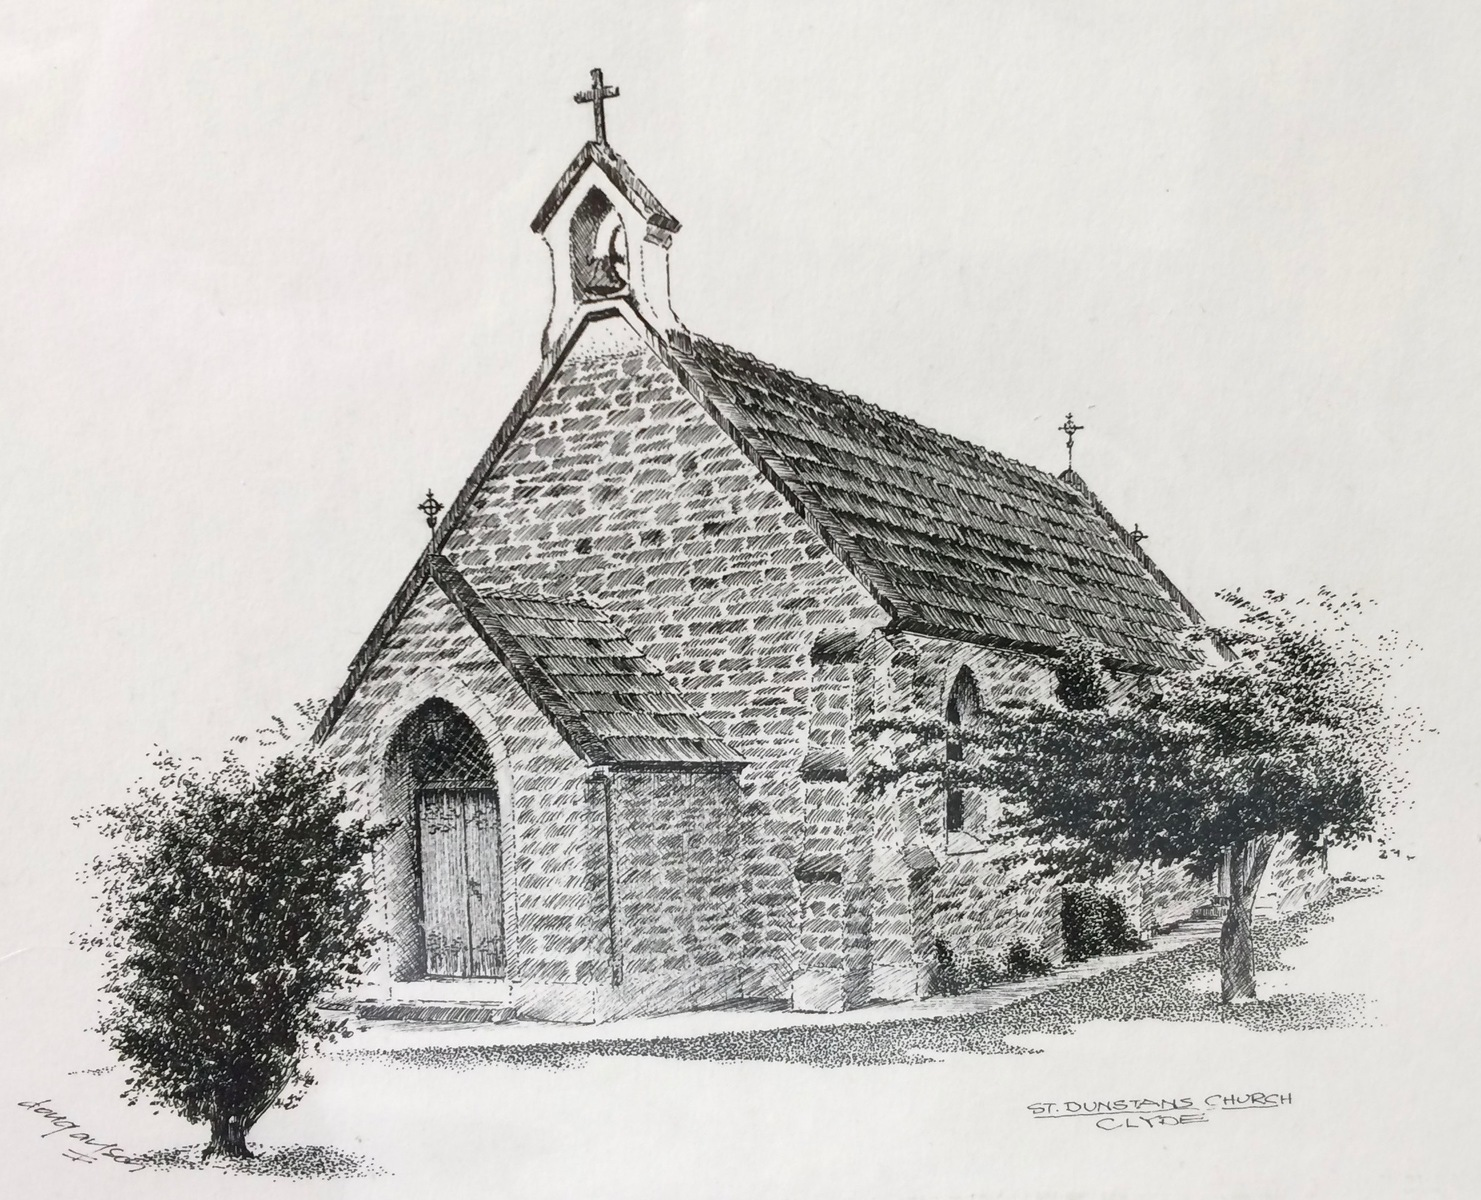 St Dunstan's Church, Clyde